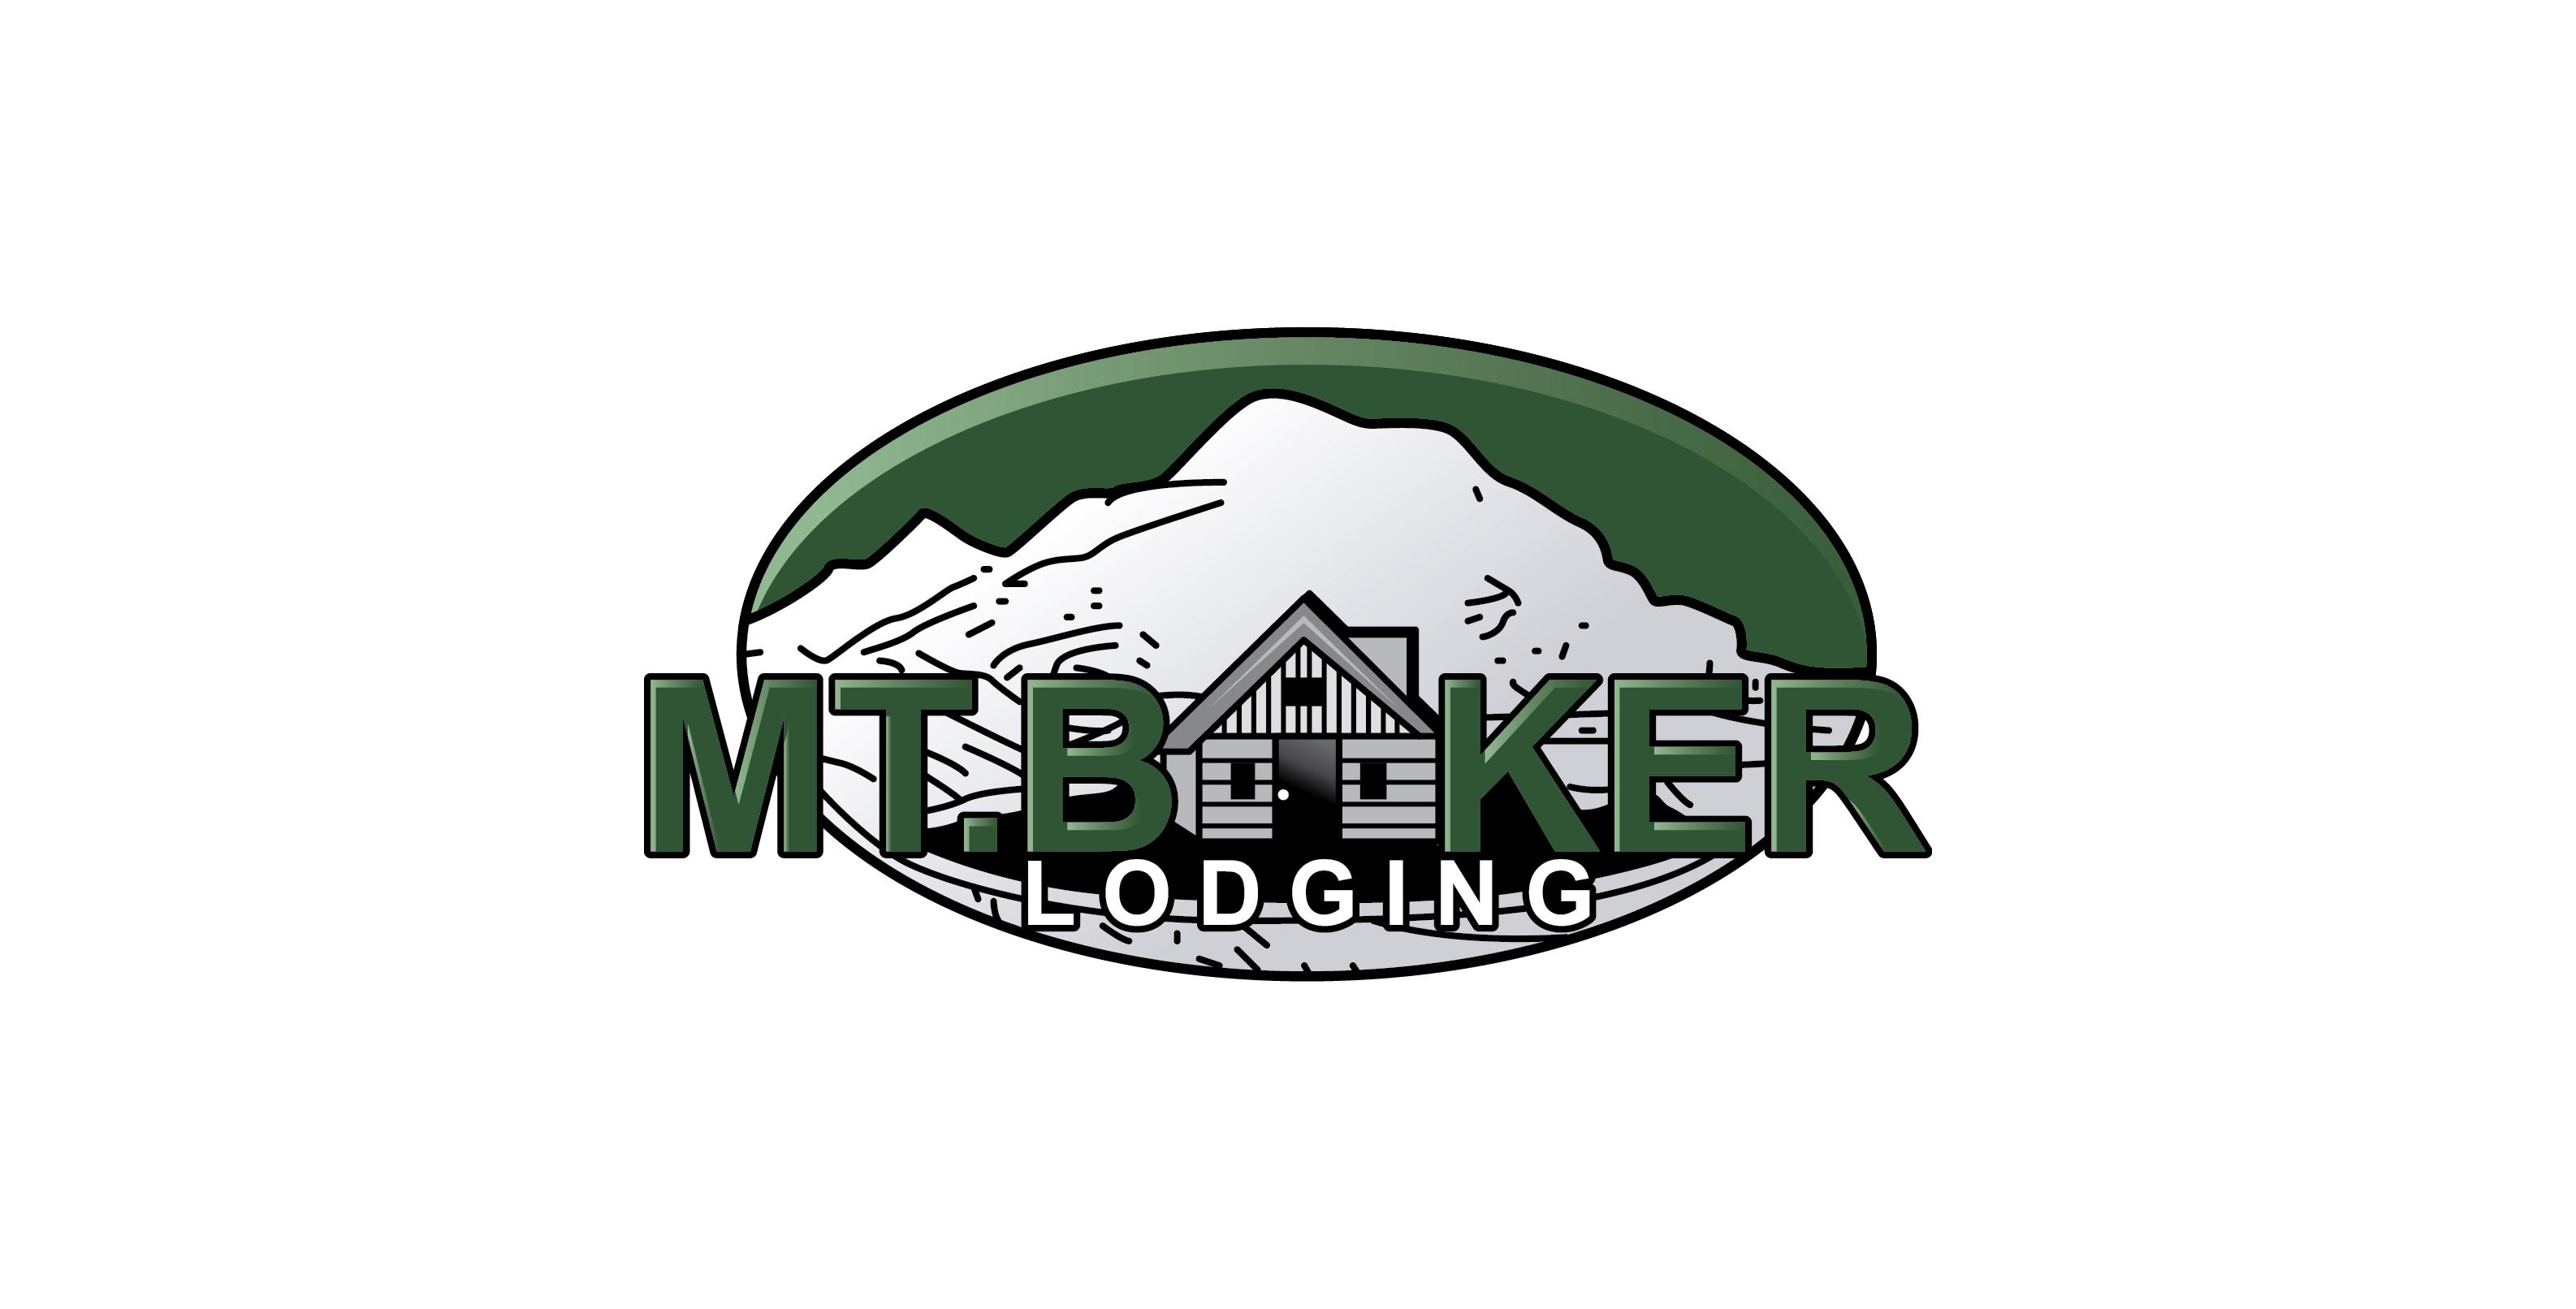 Apartment Mt  Baker Lodging Cabin  10     REAL LOG CABIN  GR-8 AMENITIES  WIFI  SLEEPS-8  photo 31816975